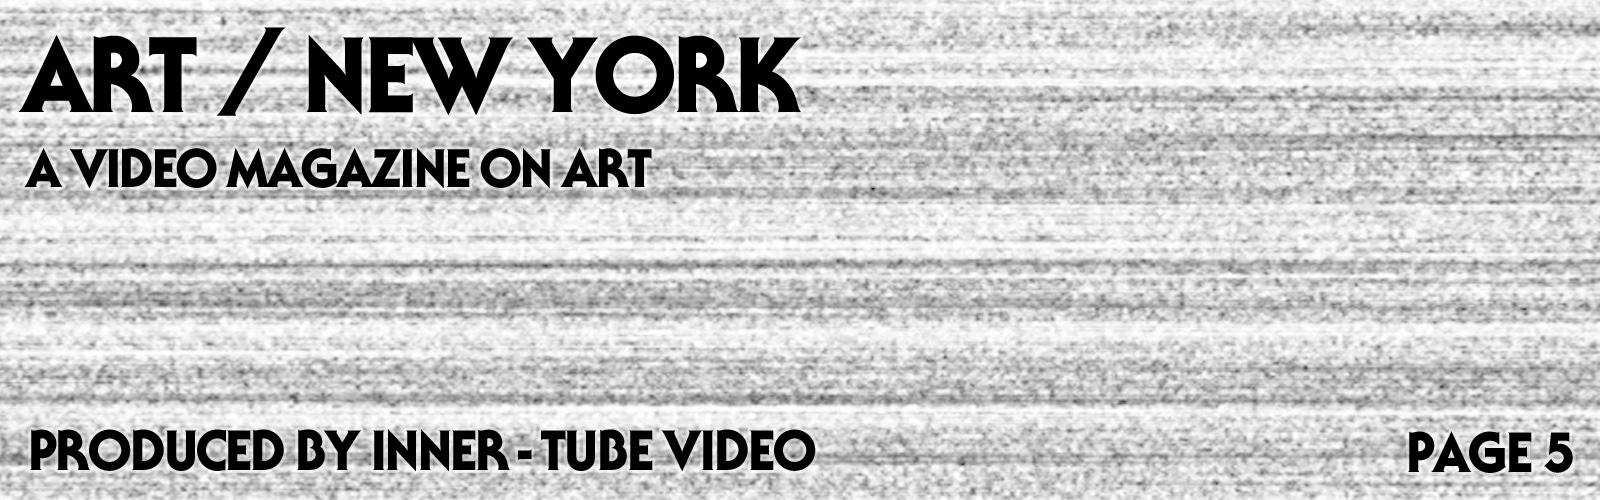 art-newyork-cover-page5.jpg